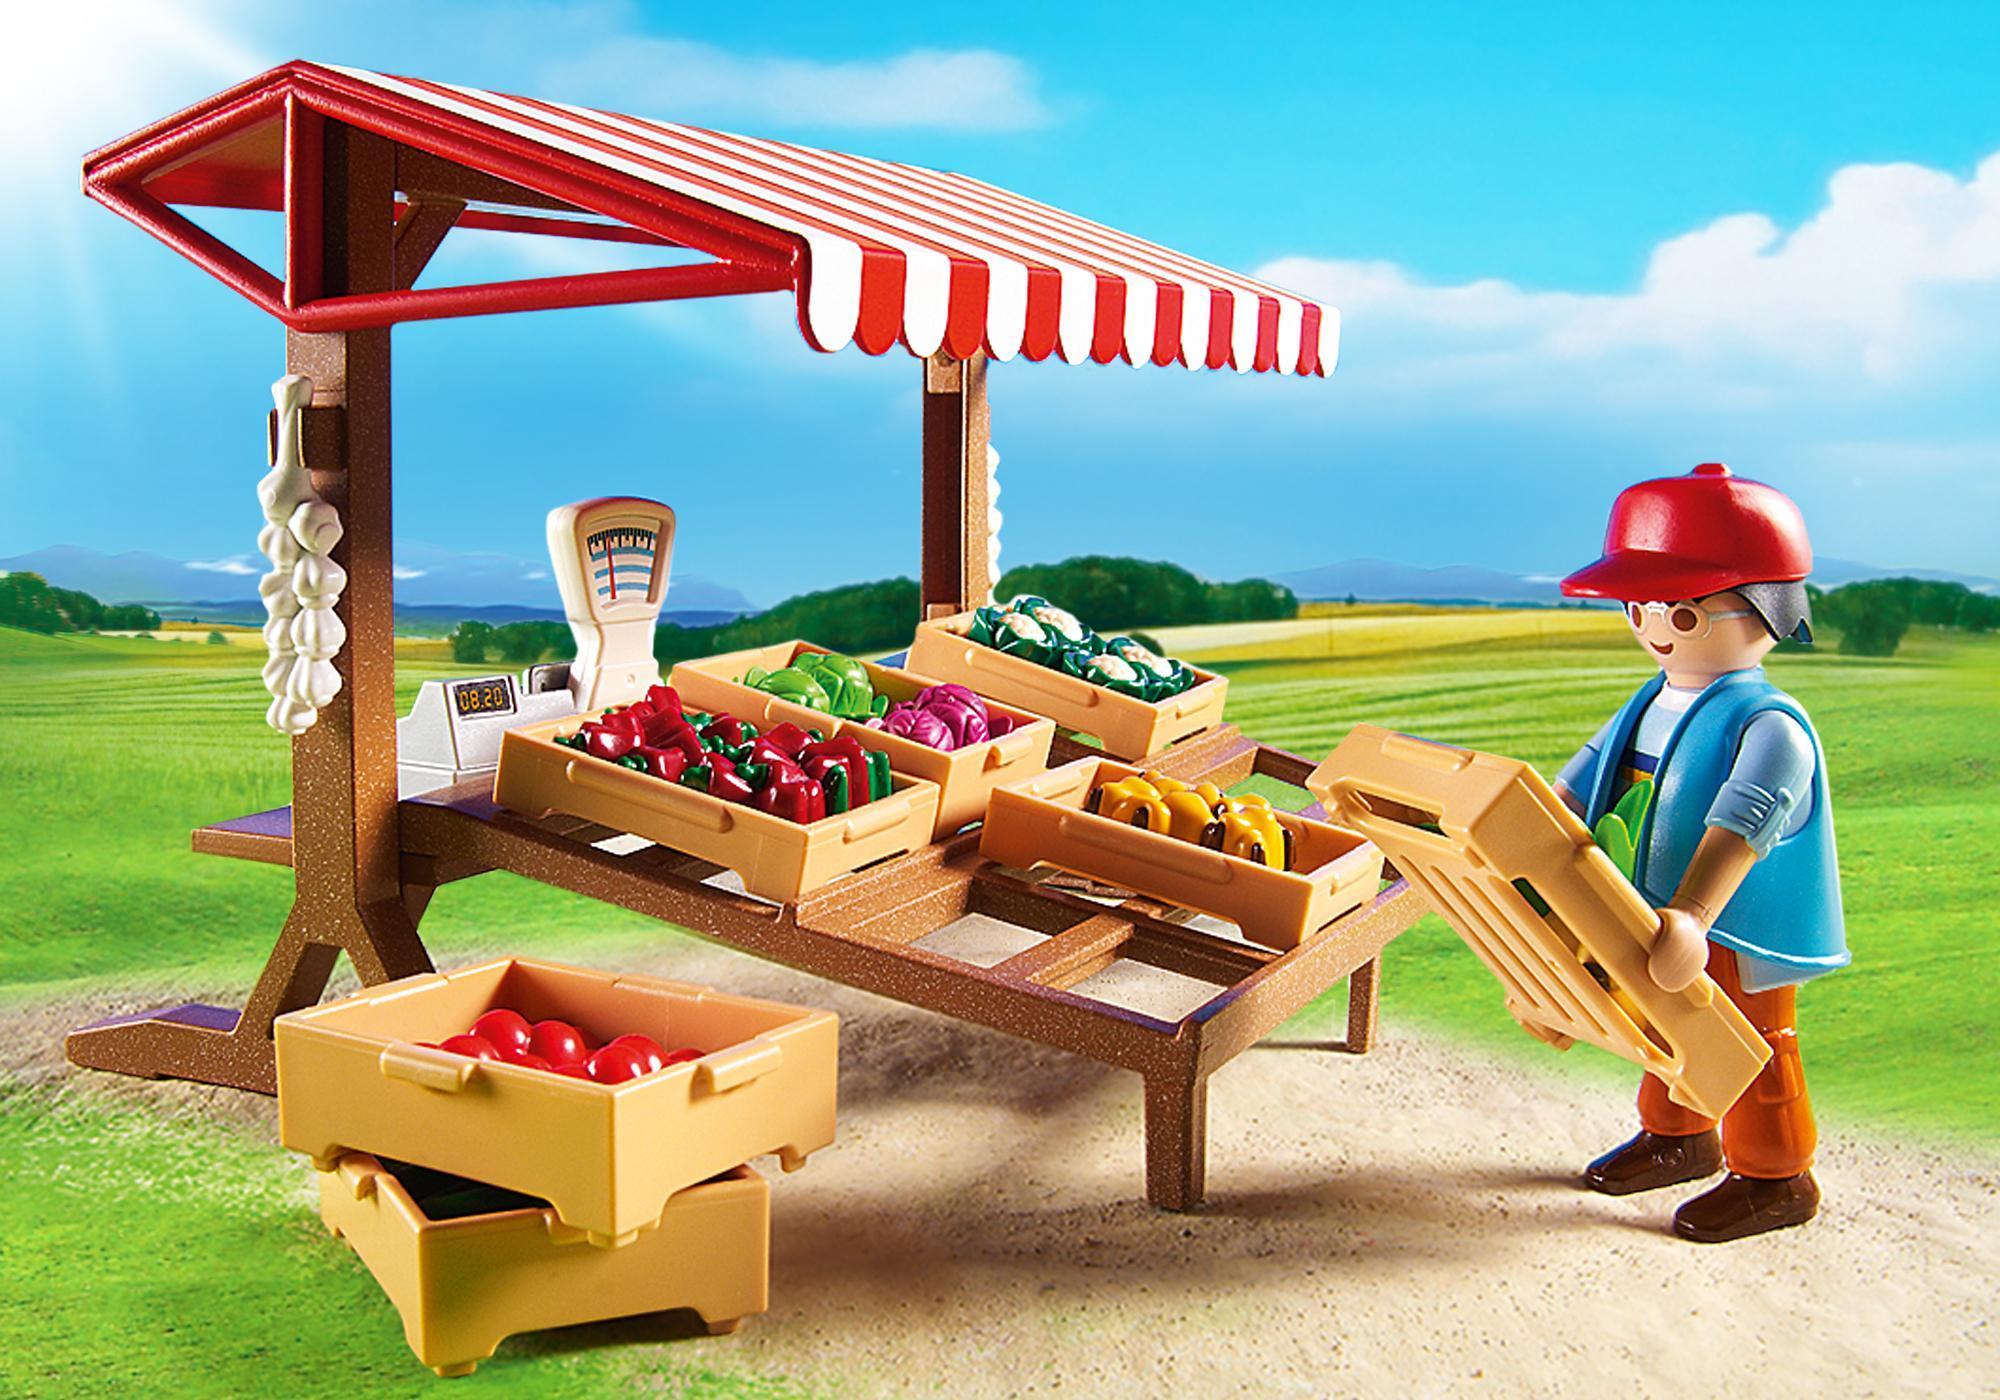 http://media.playmobil.com/i/playmobil/6121_product_extra2/Marchand avec étal de légumes